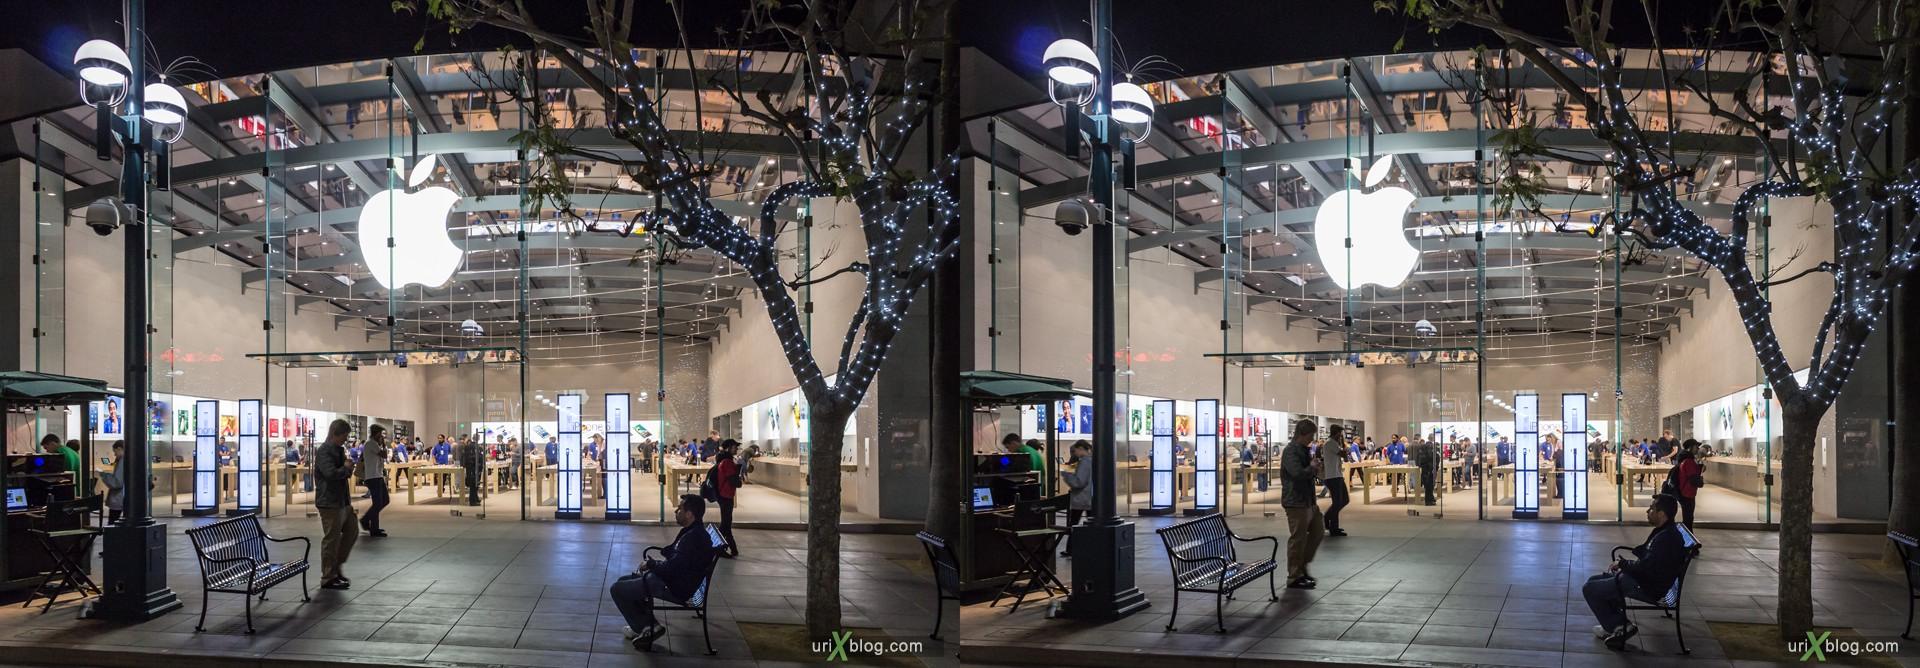 2013, Apple, Apple Store, 1415 3rd Street Promenade, Santa Monica, Los Angeles, LA, USA, 3D, stereo pair, cross-eyed, crossview, cross view stereo pair, stereoscopic